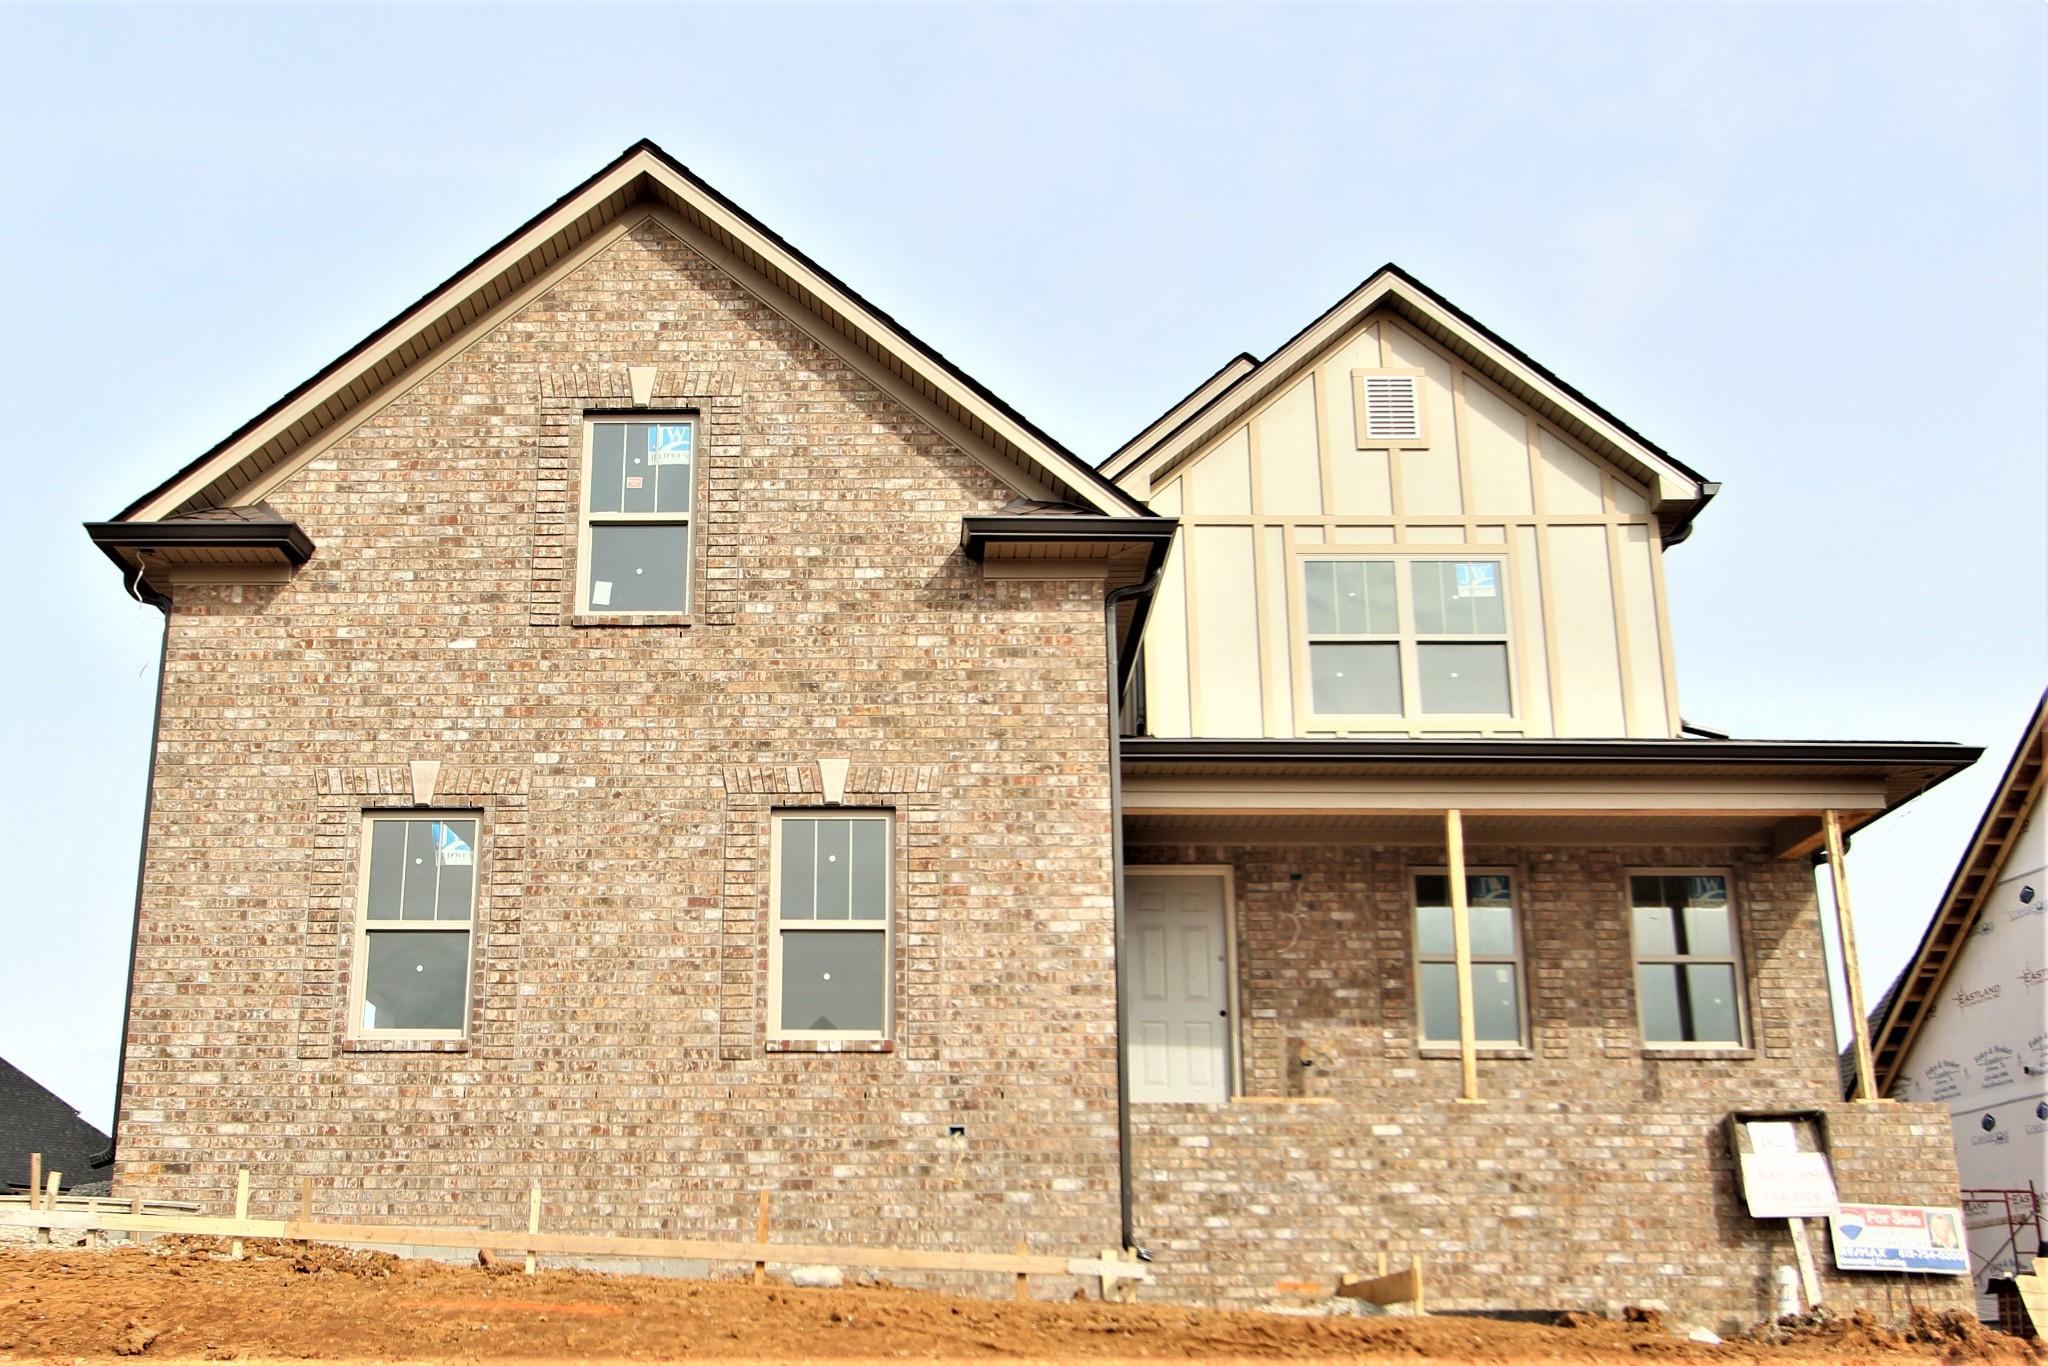 82 Ernest Drive #82, Lebanon, TN 37087 - Lebanon, TN real estate listing